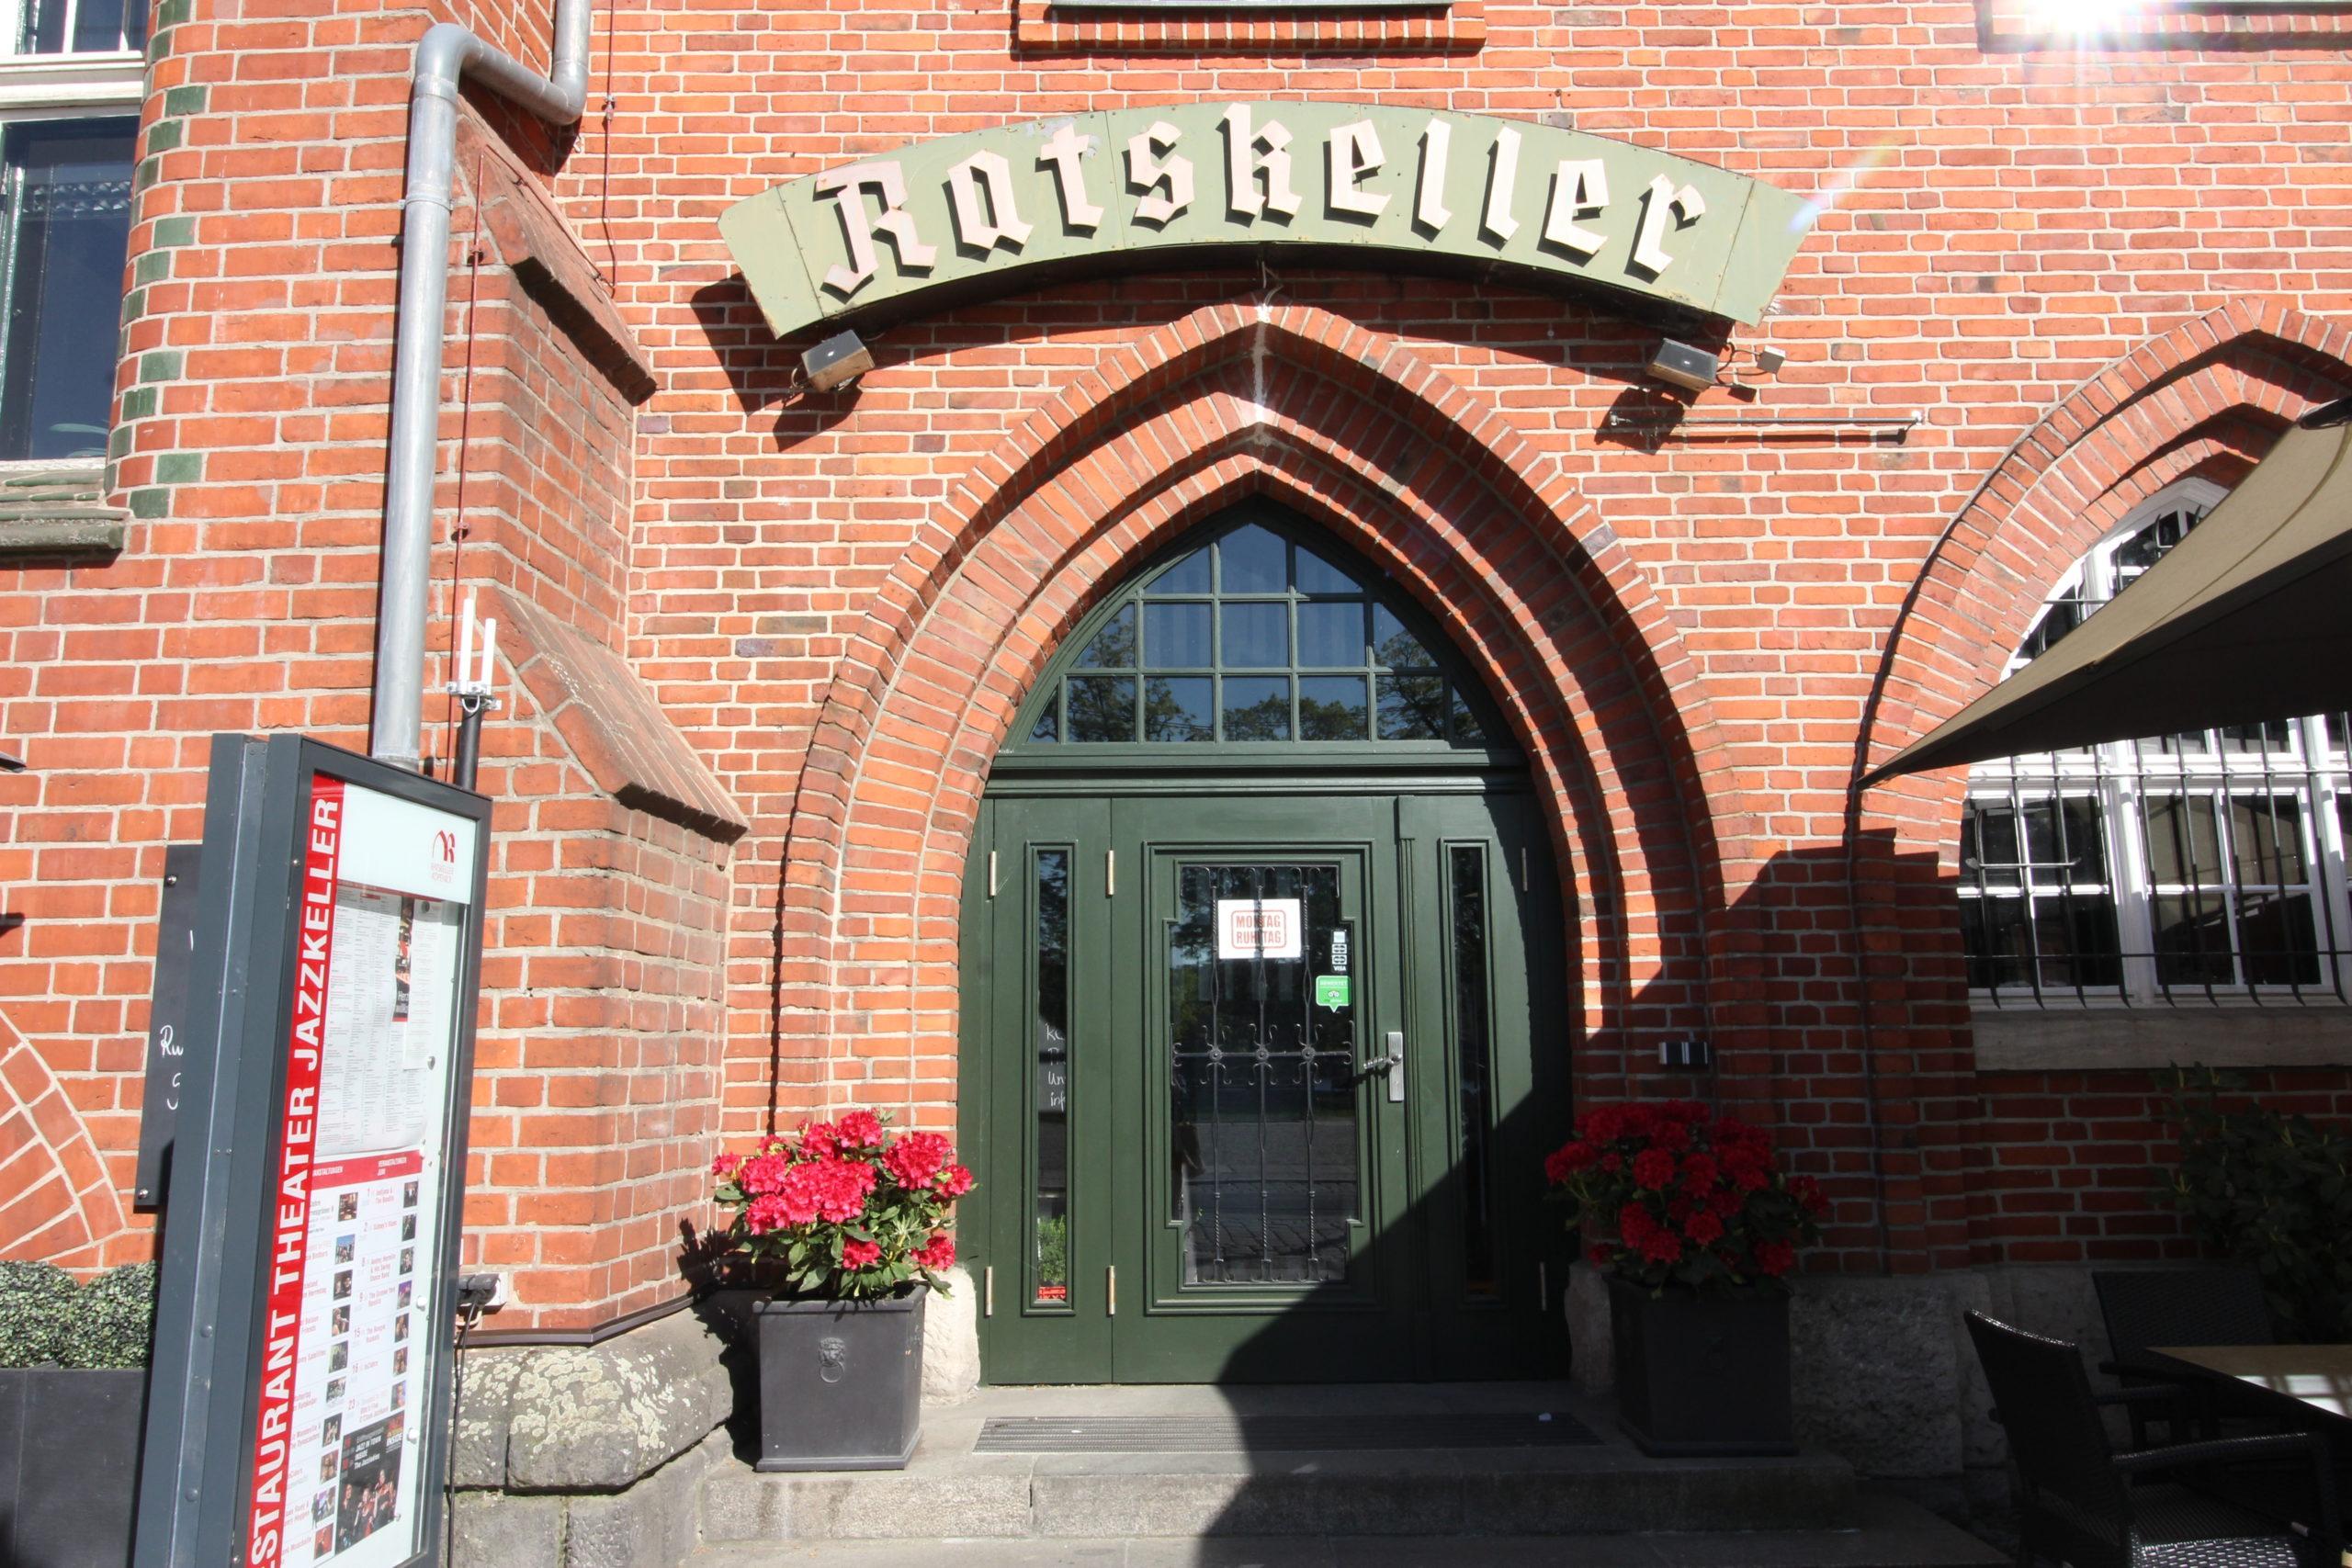 Rathaus Köpenick Ratskeller